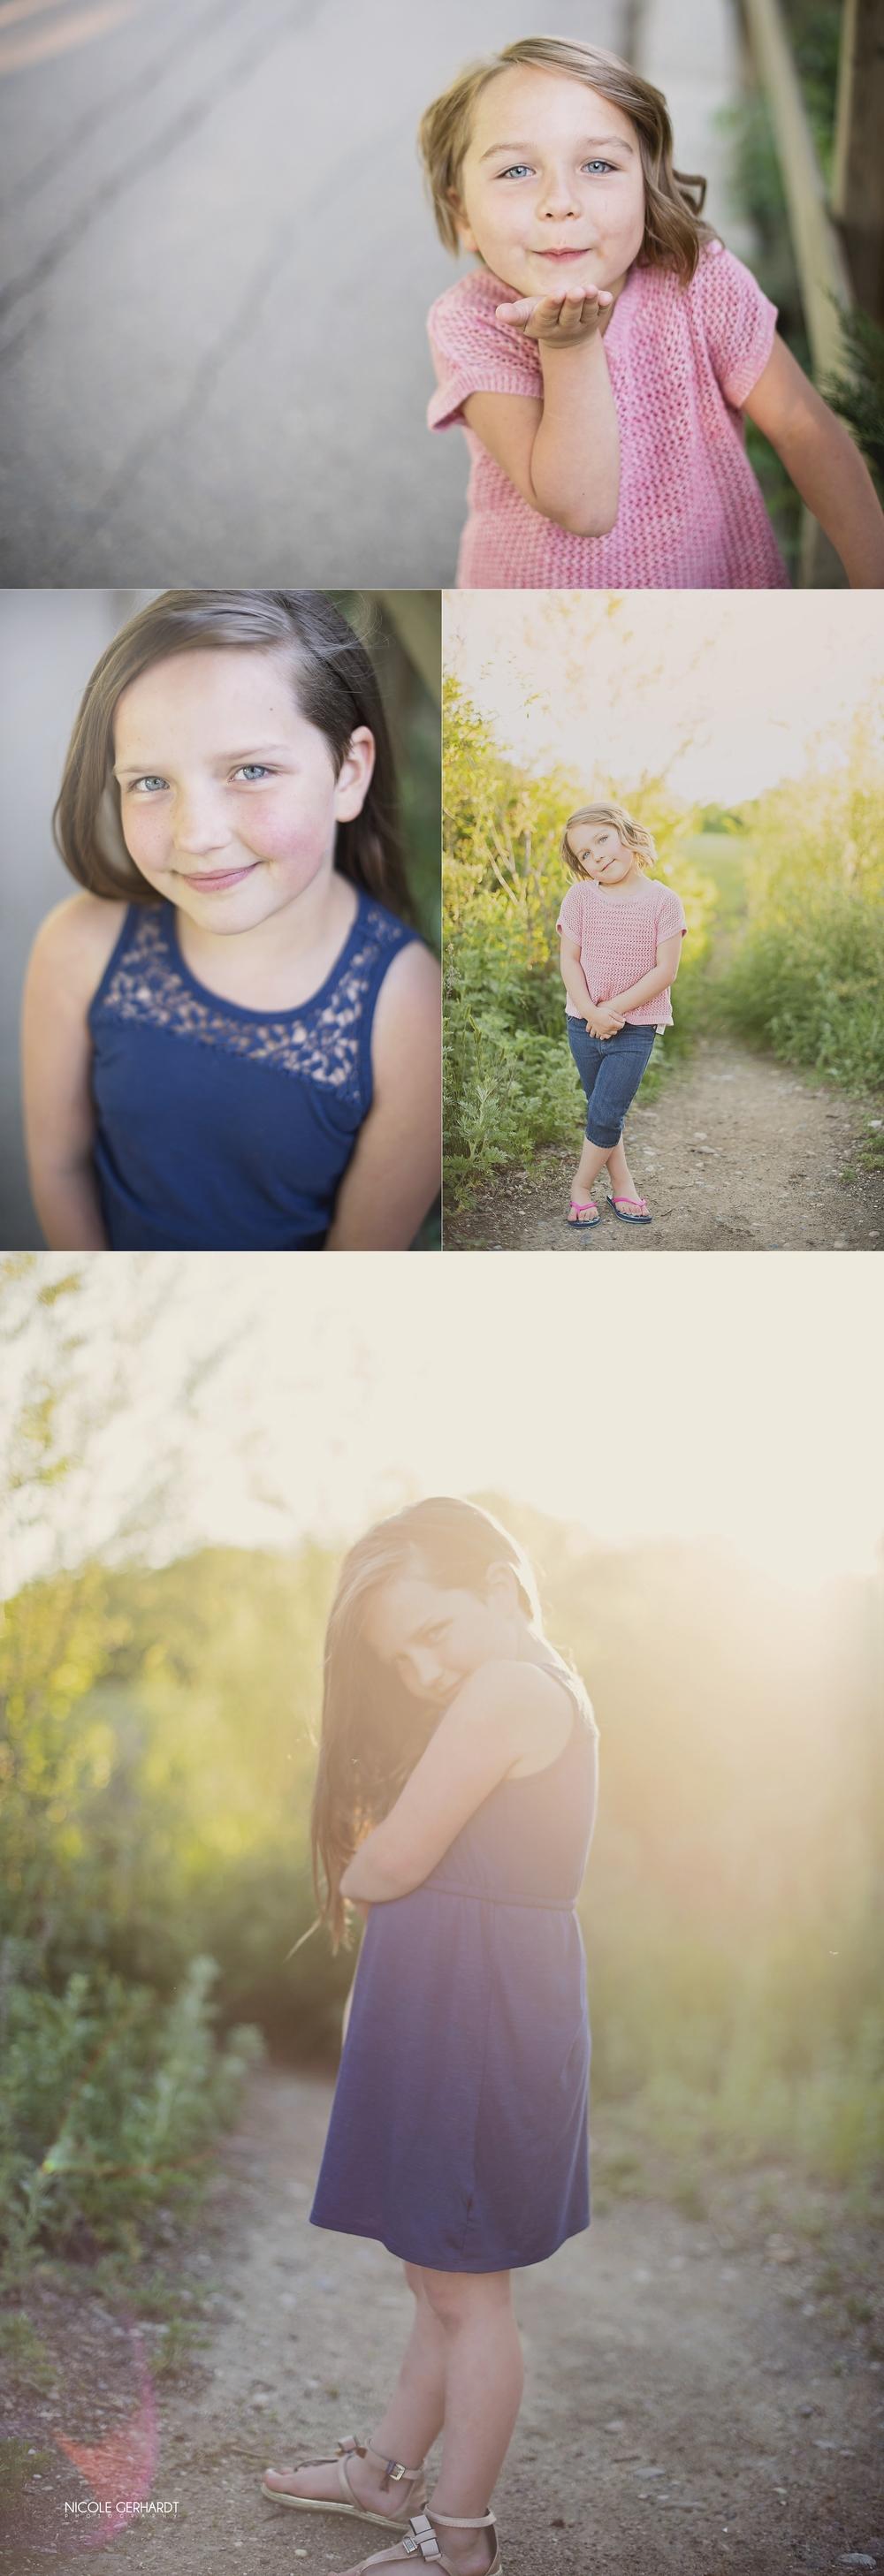 brady.family.photography.regina.moosejaw2.jpg